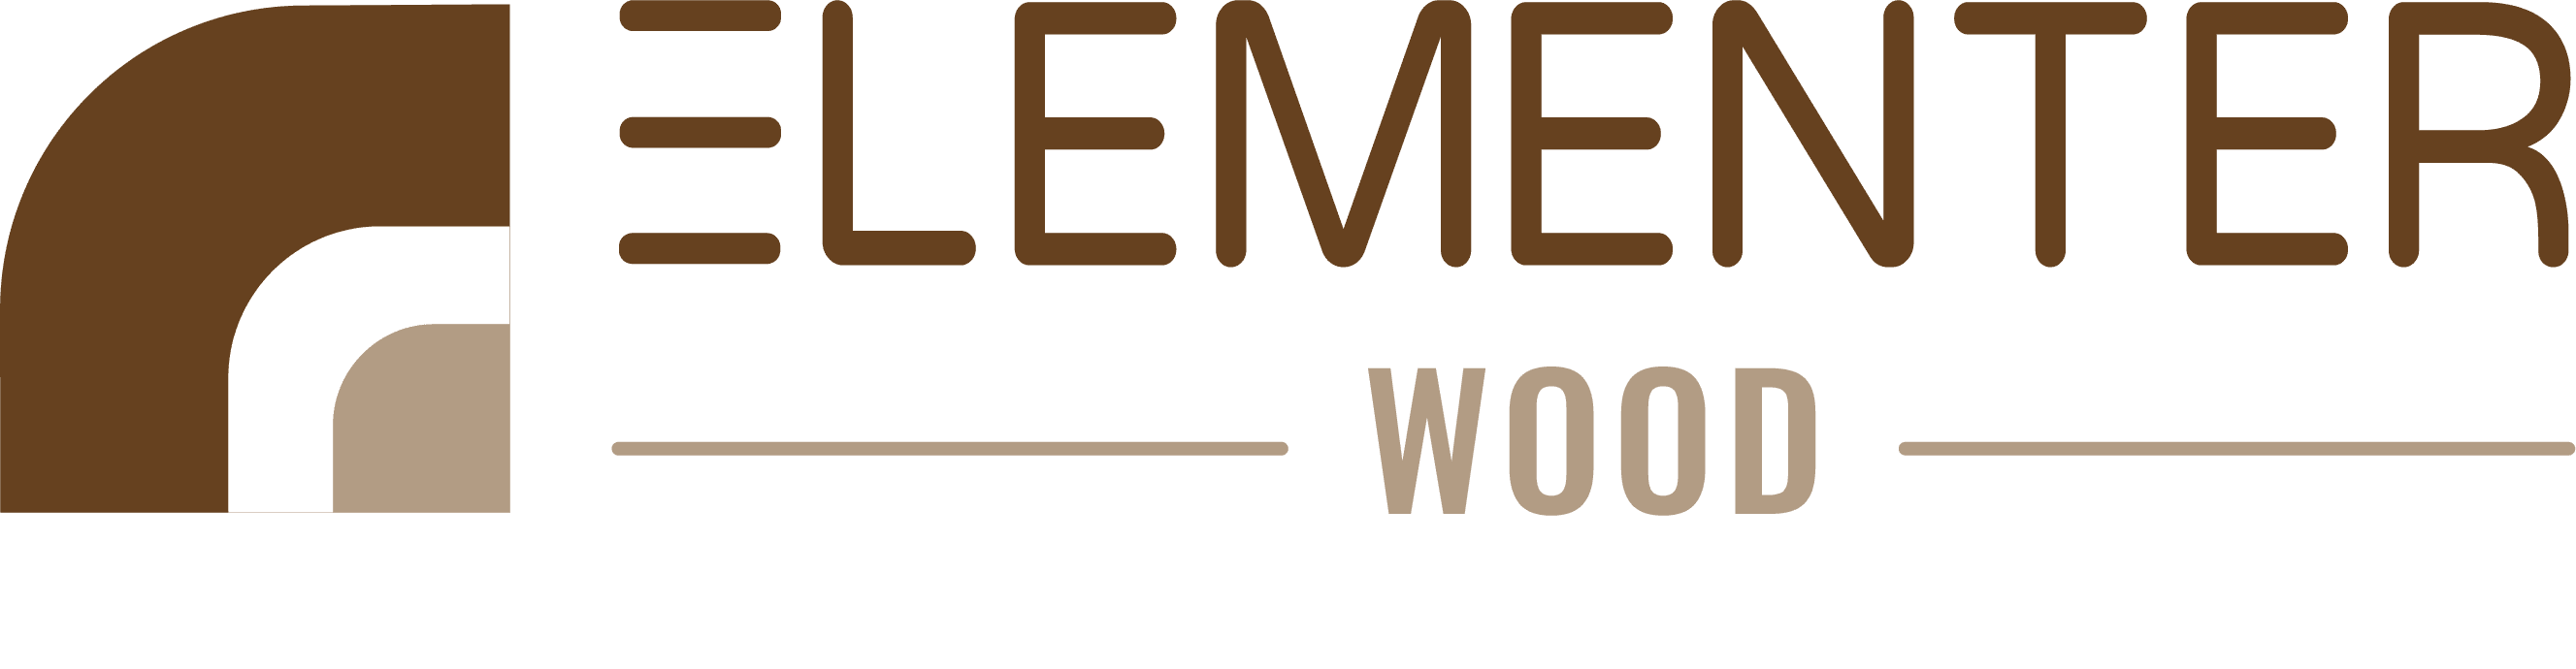 Elementer wood